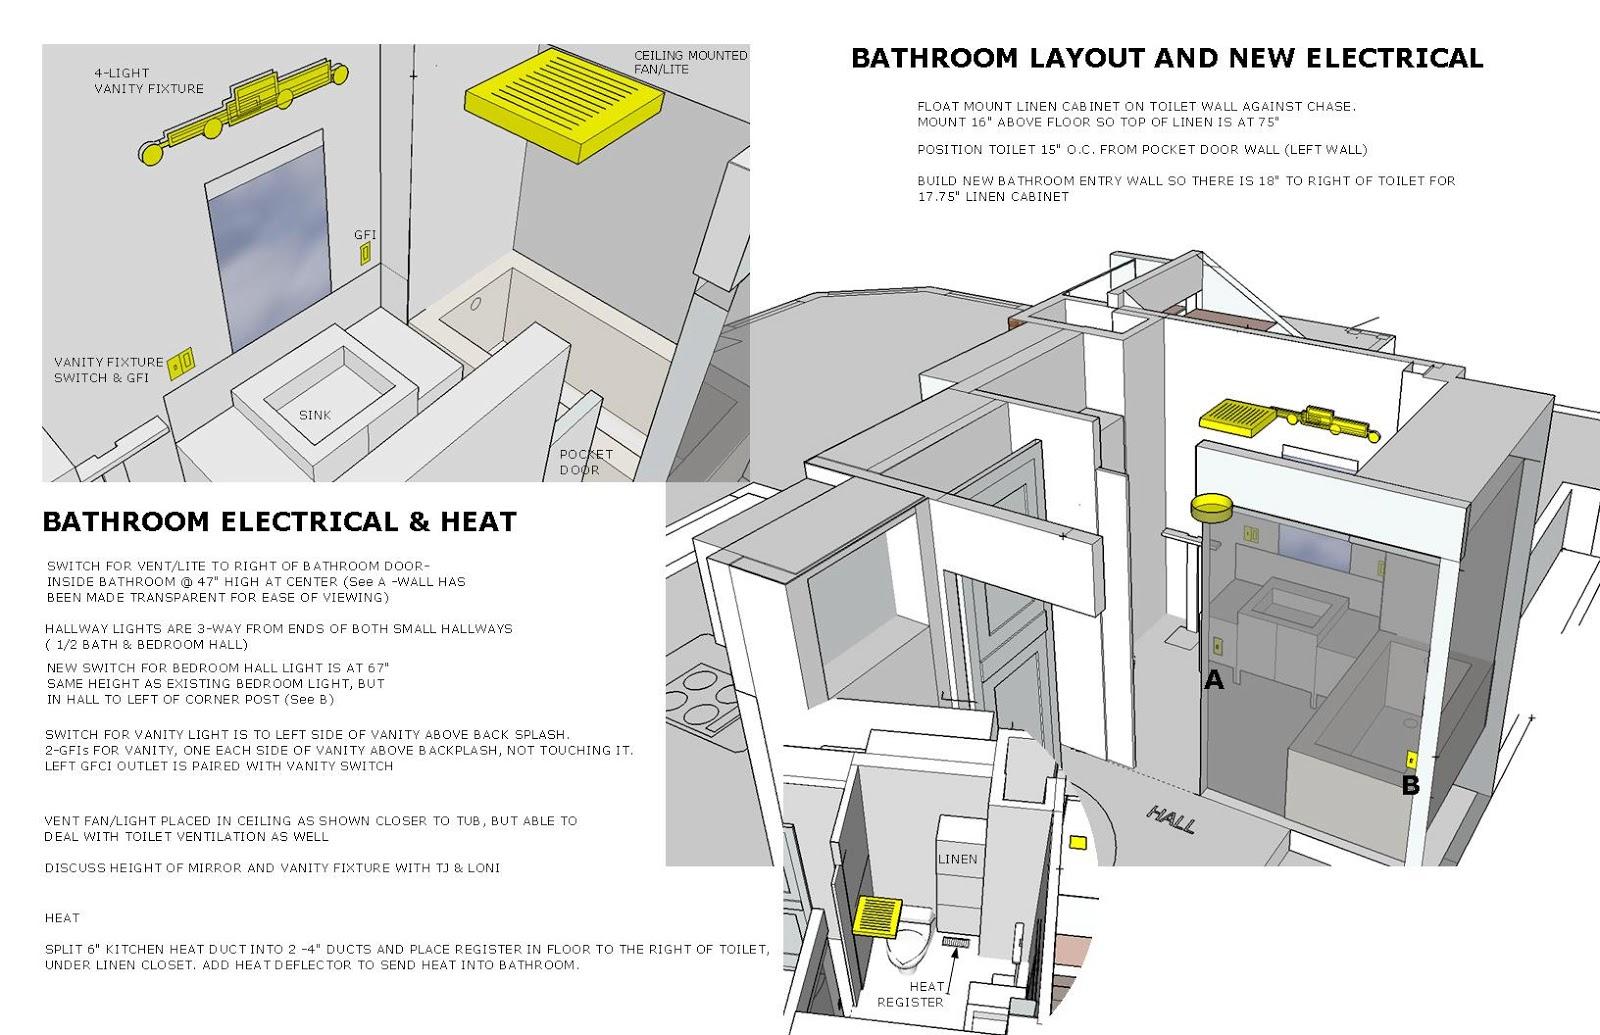 Bathroom Electrical Design | HOME DECORATION LIVE